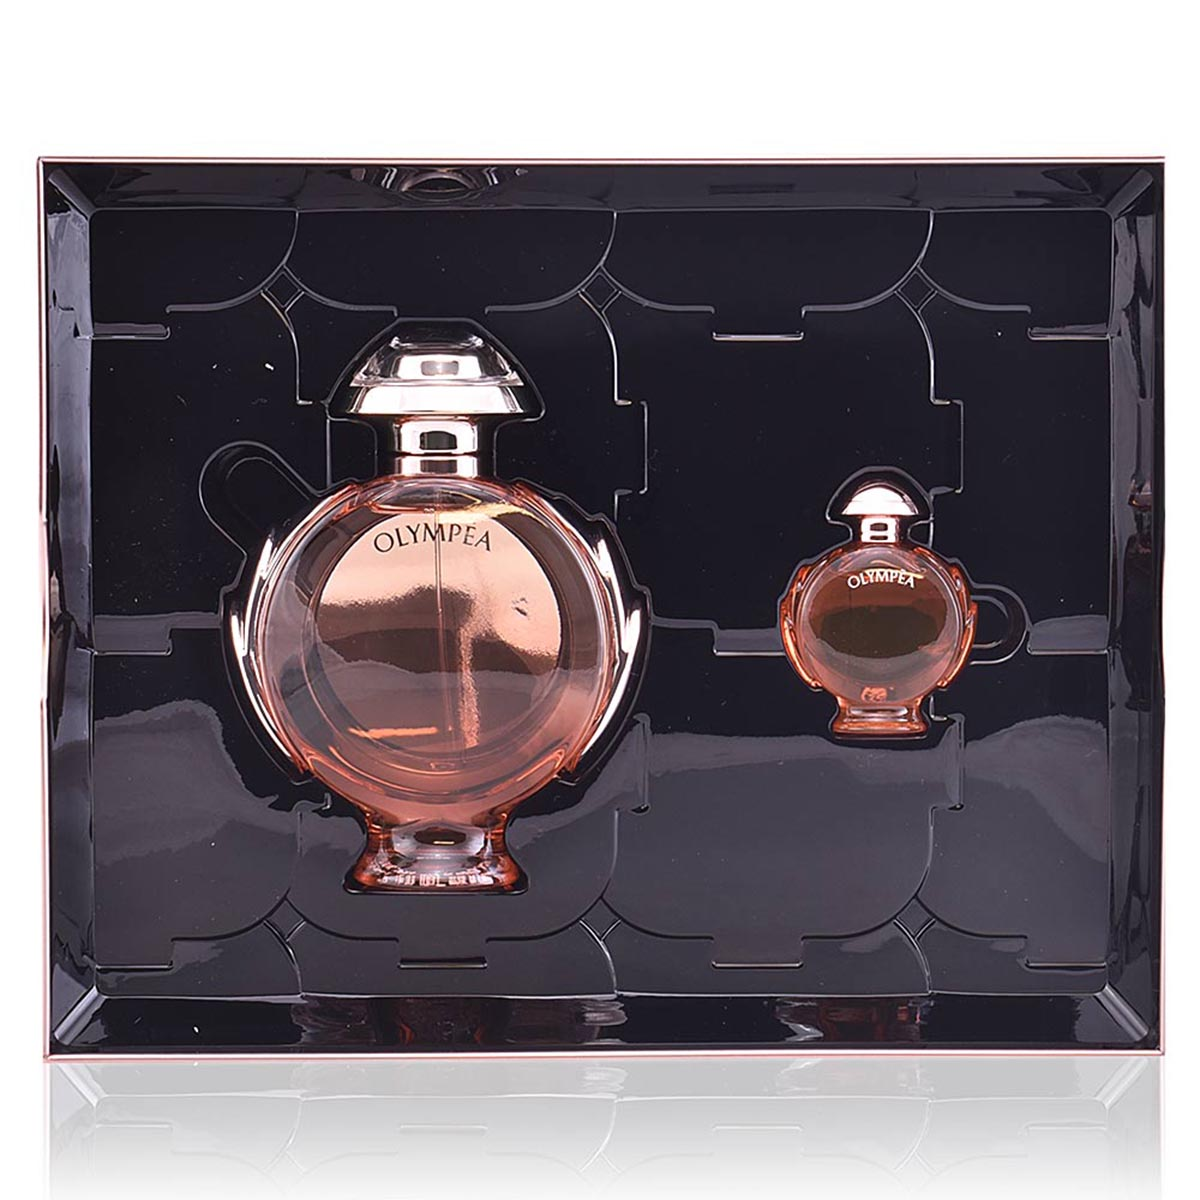 Paco rabanne olympea aqua eau de parfum 80ml vaporizador miniatura 6ml